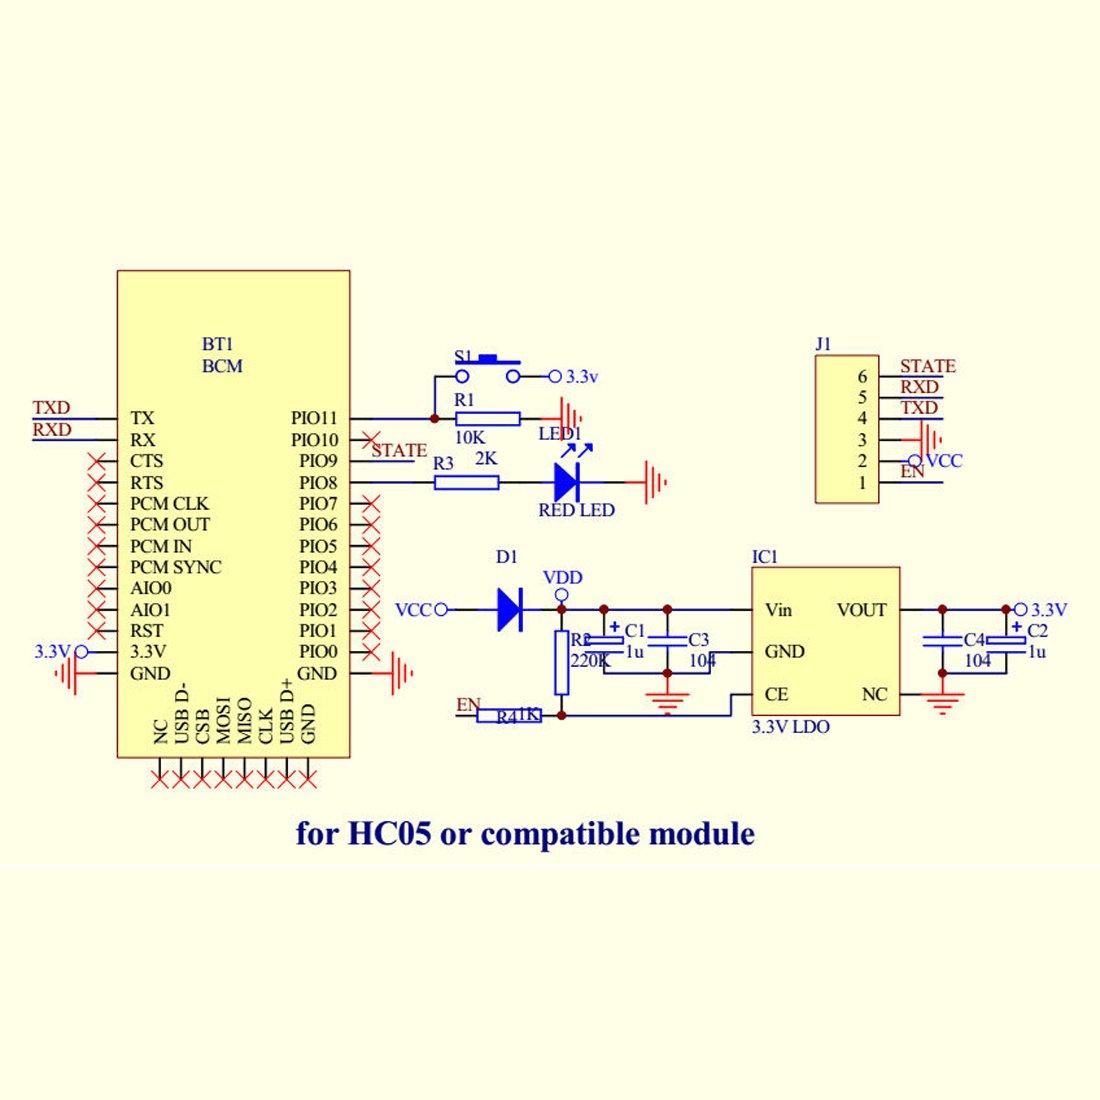 Hiletgo Hc 05 6 Pin Wireless Bluetooth Rf Transceiver Block Diagram Module Serial Bt For Arduino Computers Accessories